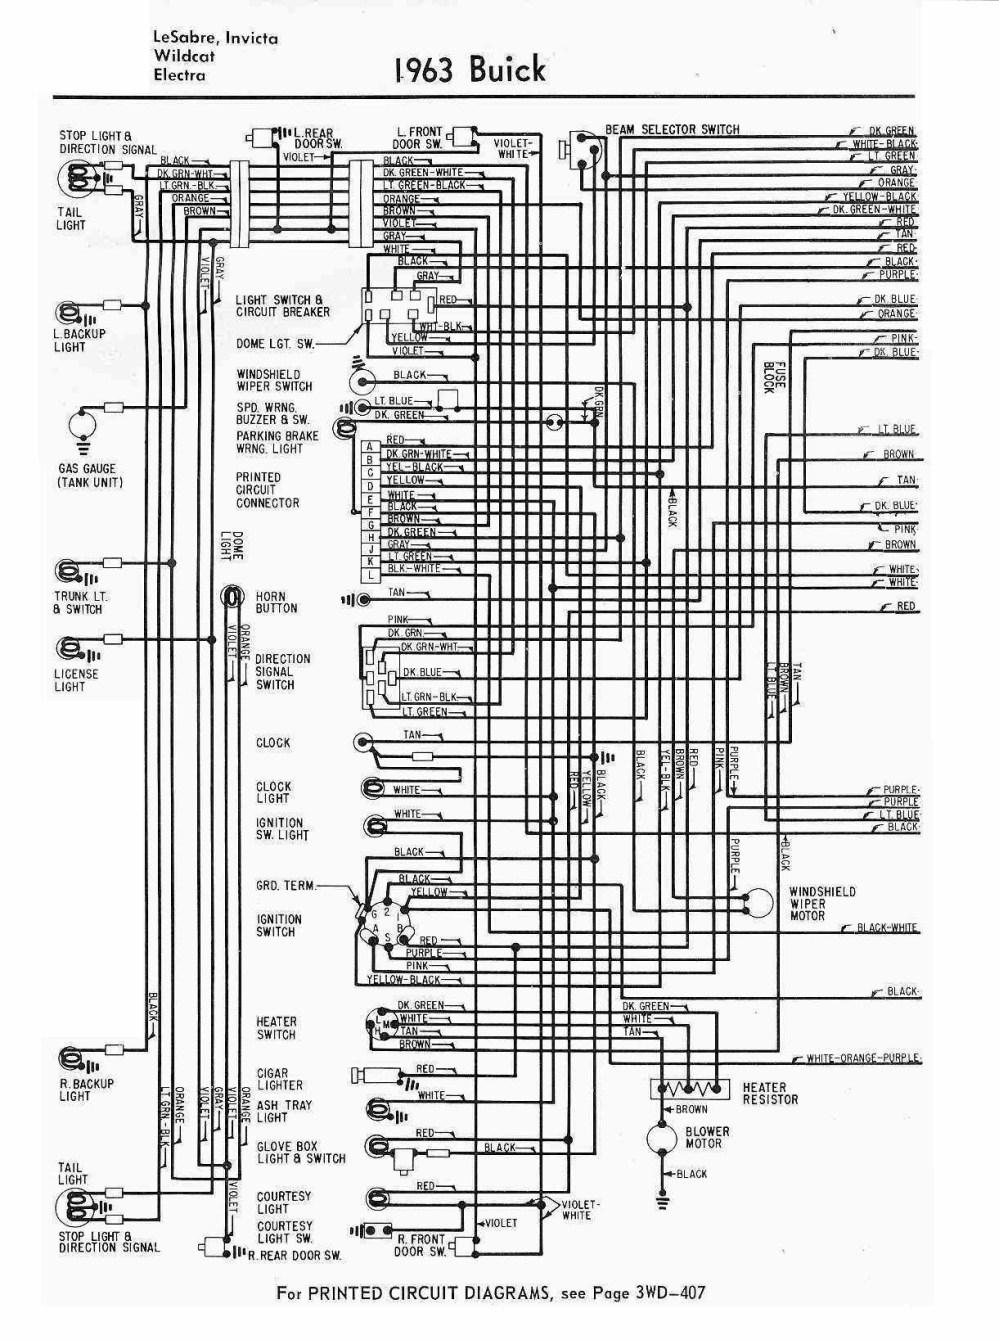 medium resolution of 2000 buick lesabre engine diagram 2003 buick lesabre radio wiring diagram shahsramblings of 2000 buick lesabre